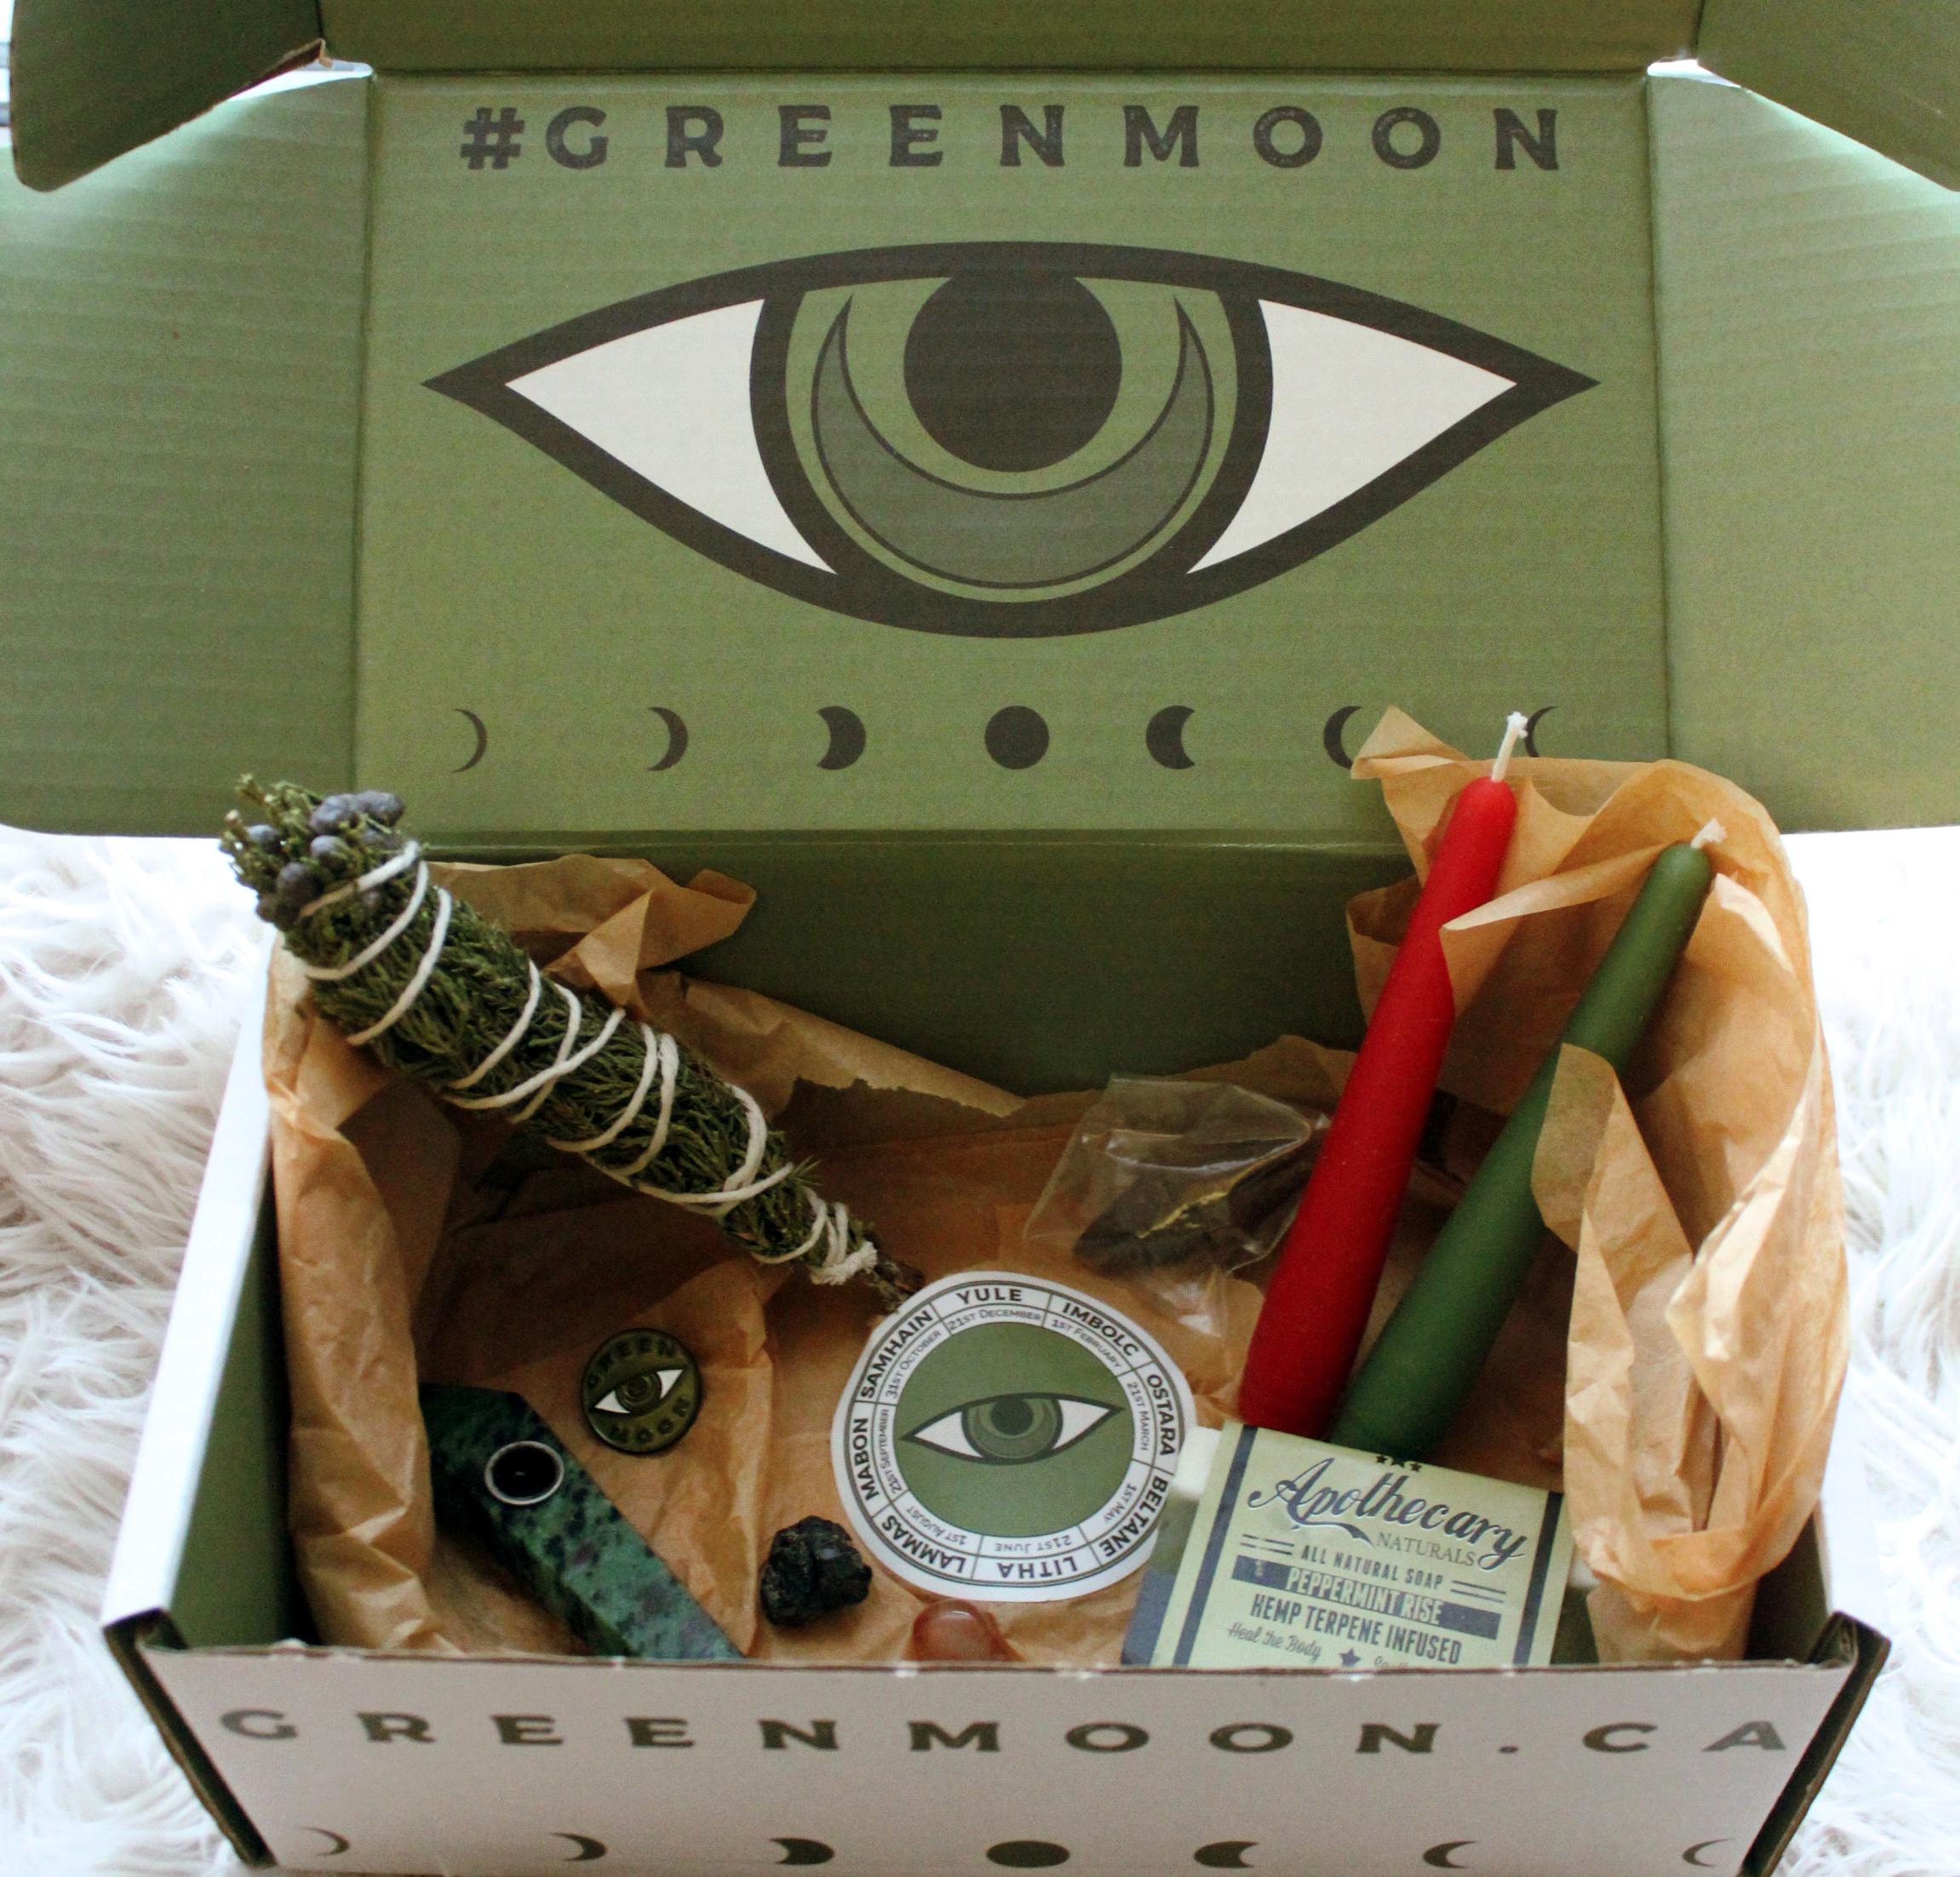 The Green Moon Apothecary Yule Box